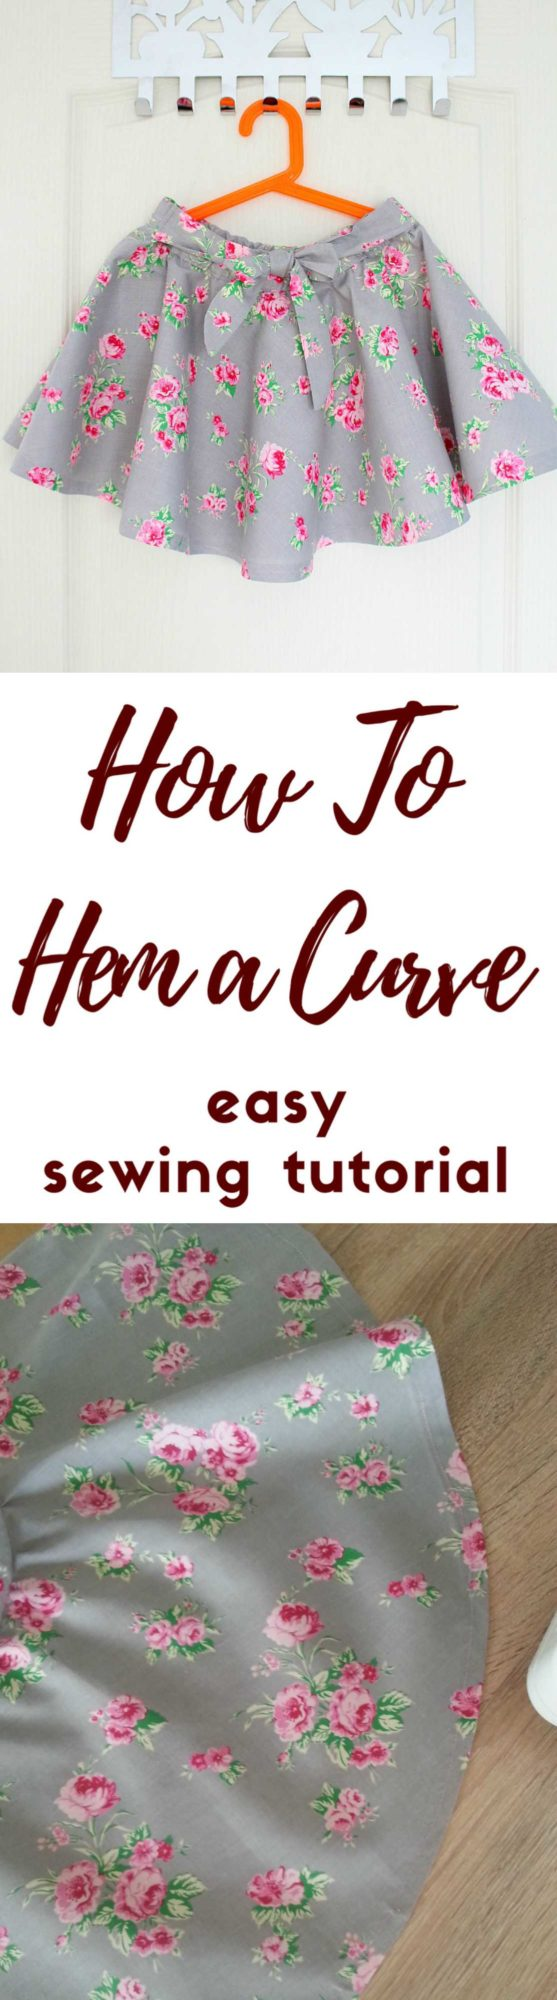 How to hem a curve